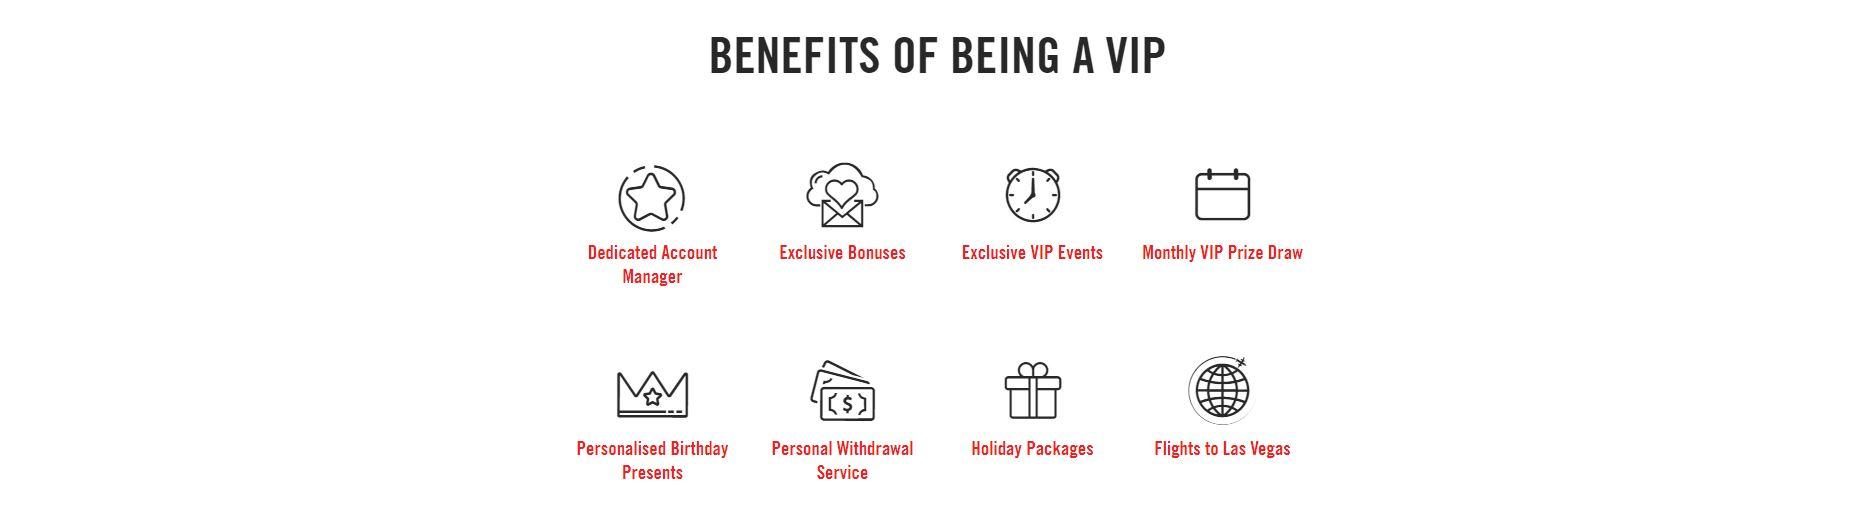 VIP Benefits at Vegas Hero